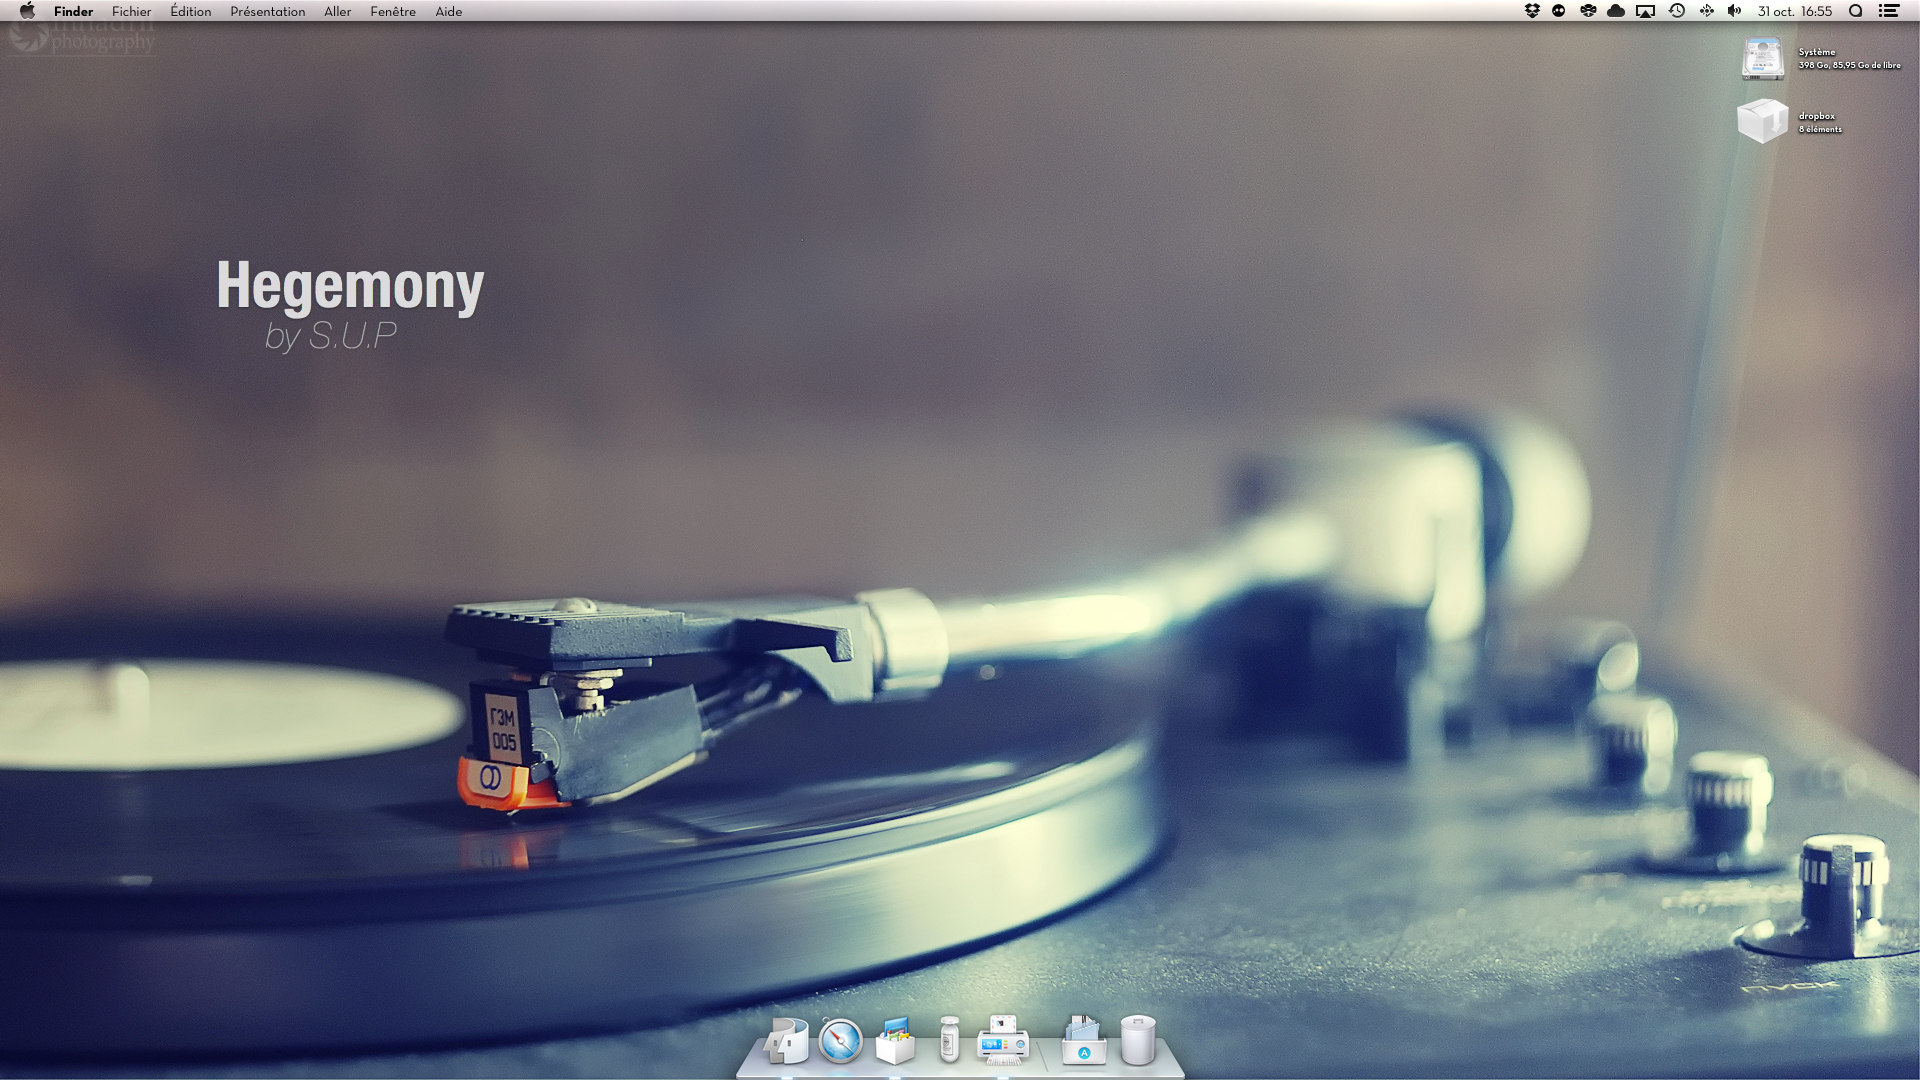 vinyl by ultr4man